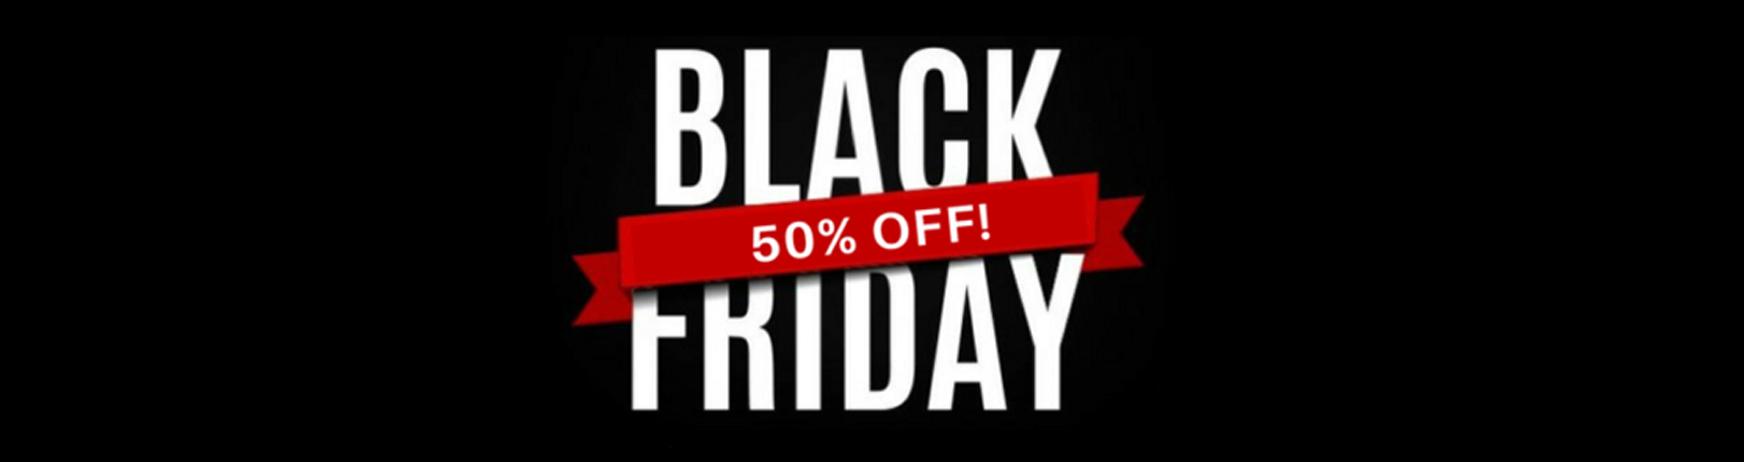 Black Friday -50% SALE